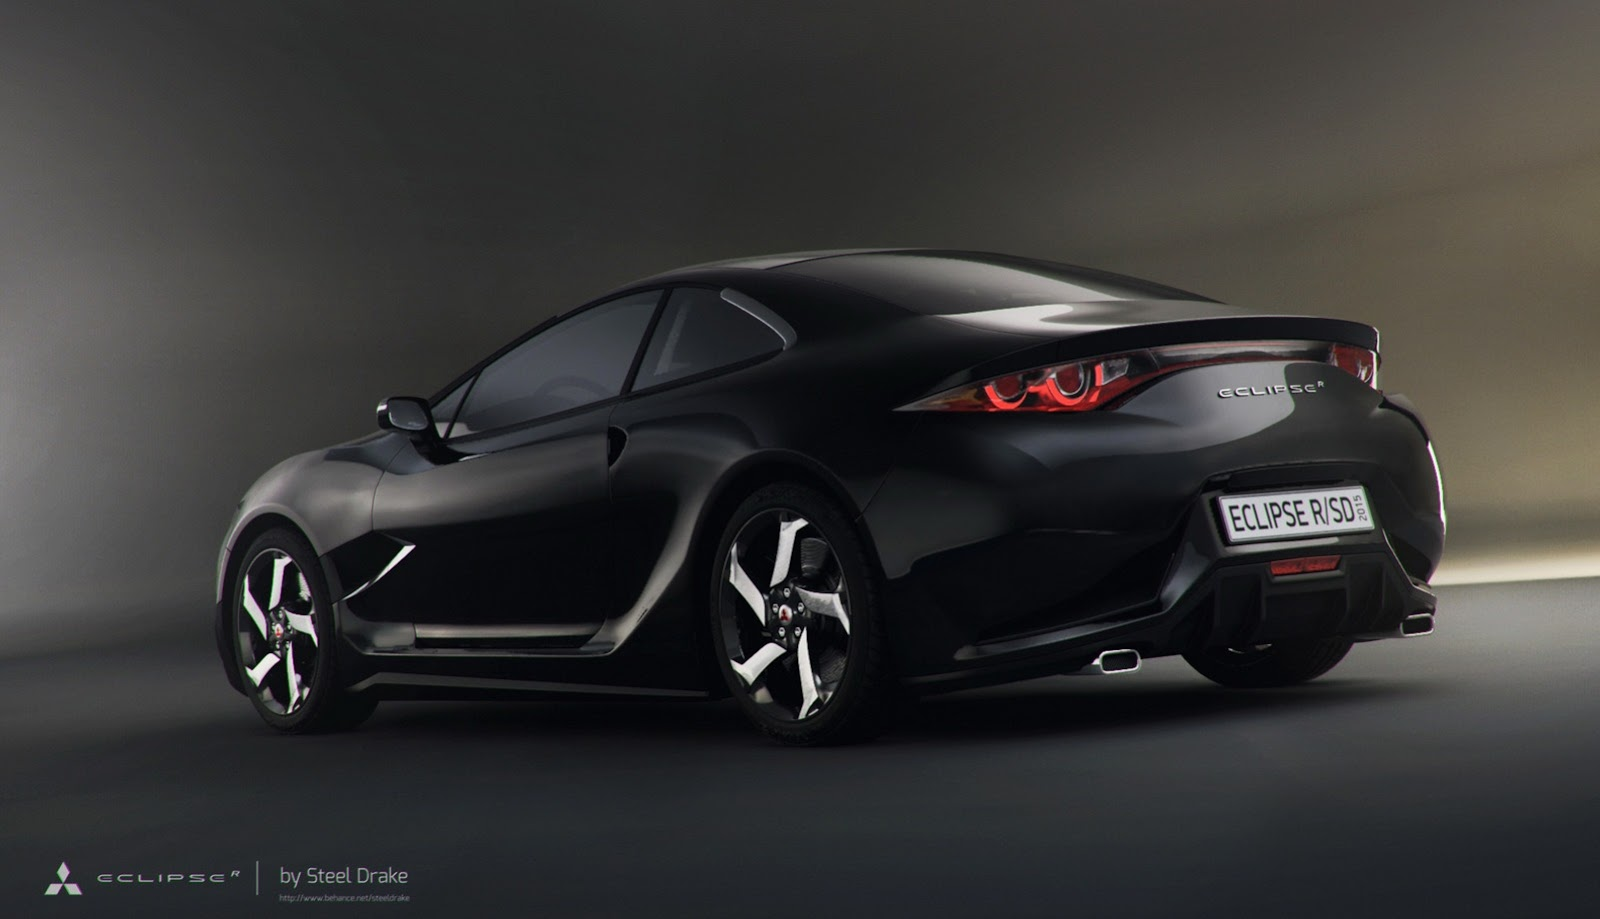 2015 Mitsubishi Eclipse >> 2015 Mitsubishi Eclipse Concept Autonetmagz Review